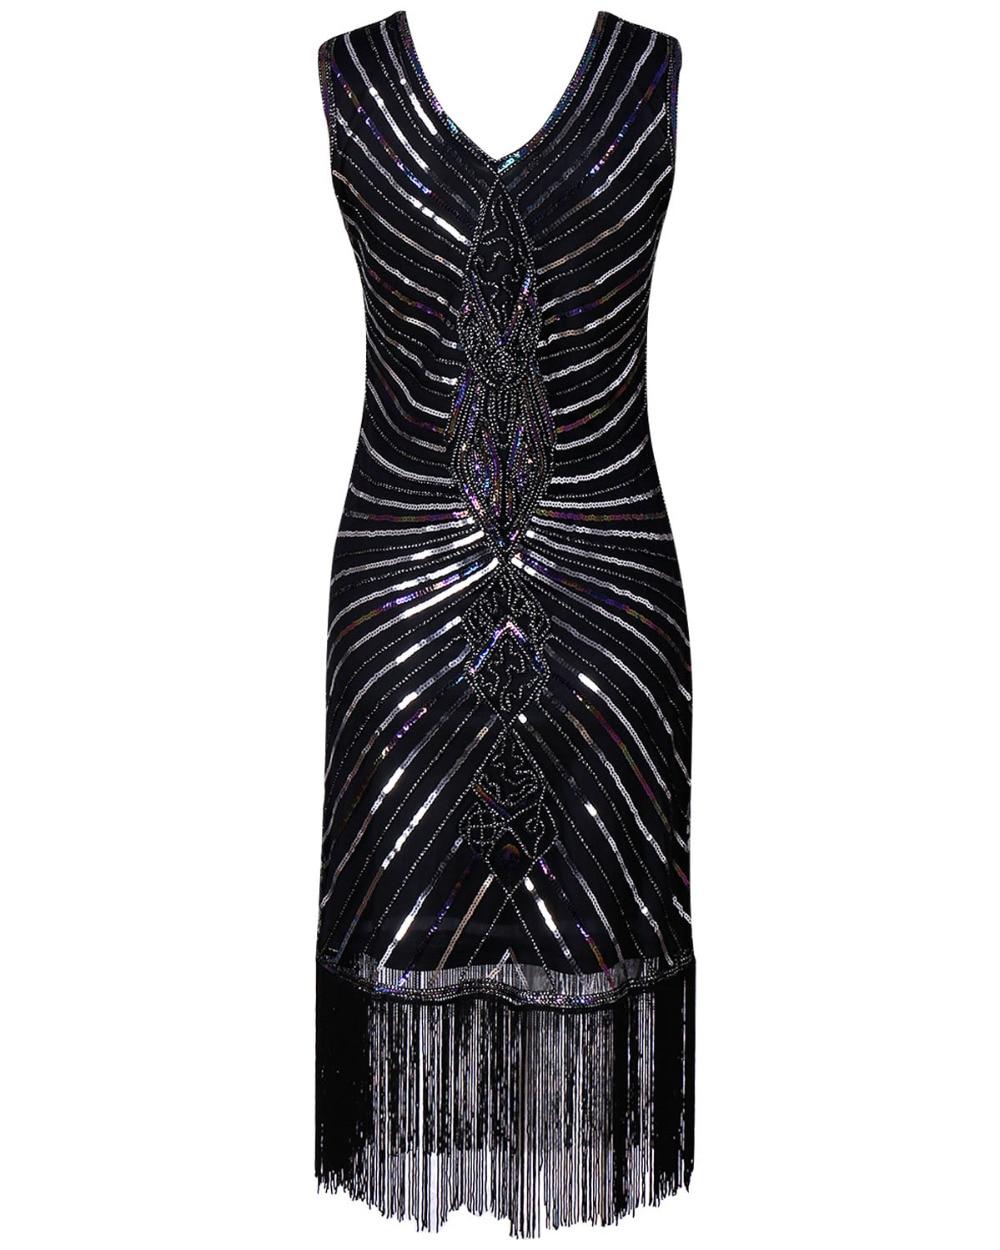 Women 1920s Diamond Sequined Embellished Fringed Great Gatsby Flapper Dress Sleeveless Retro Midi Party Dress Ukraine Vestidos